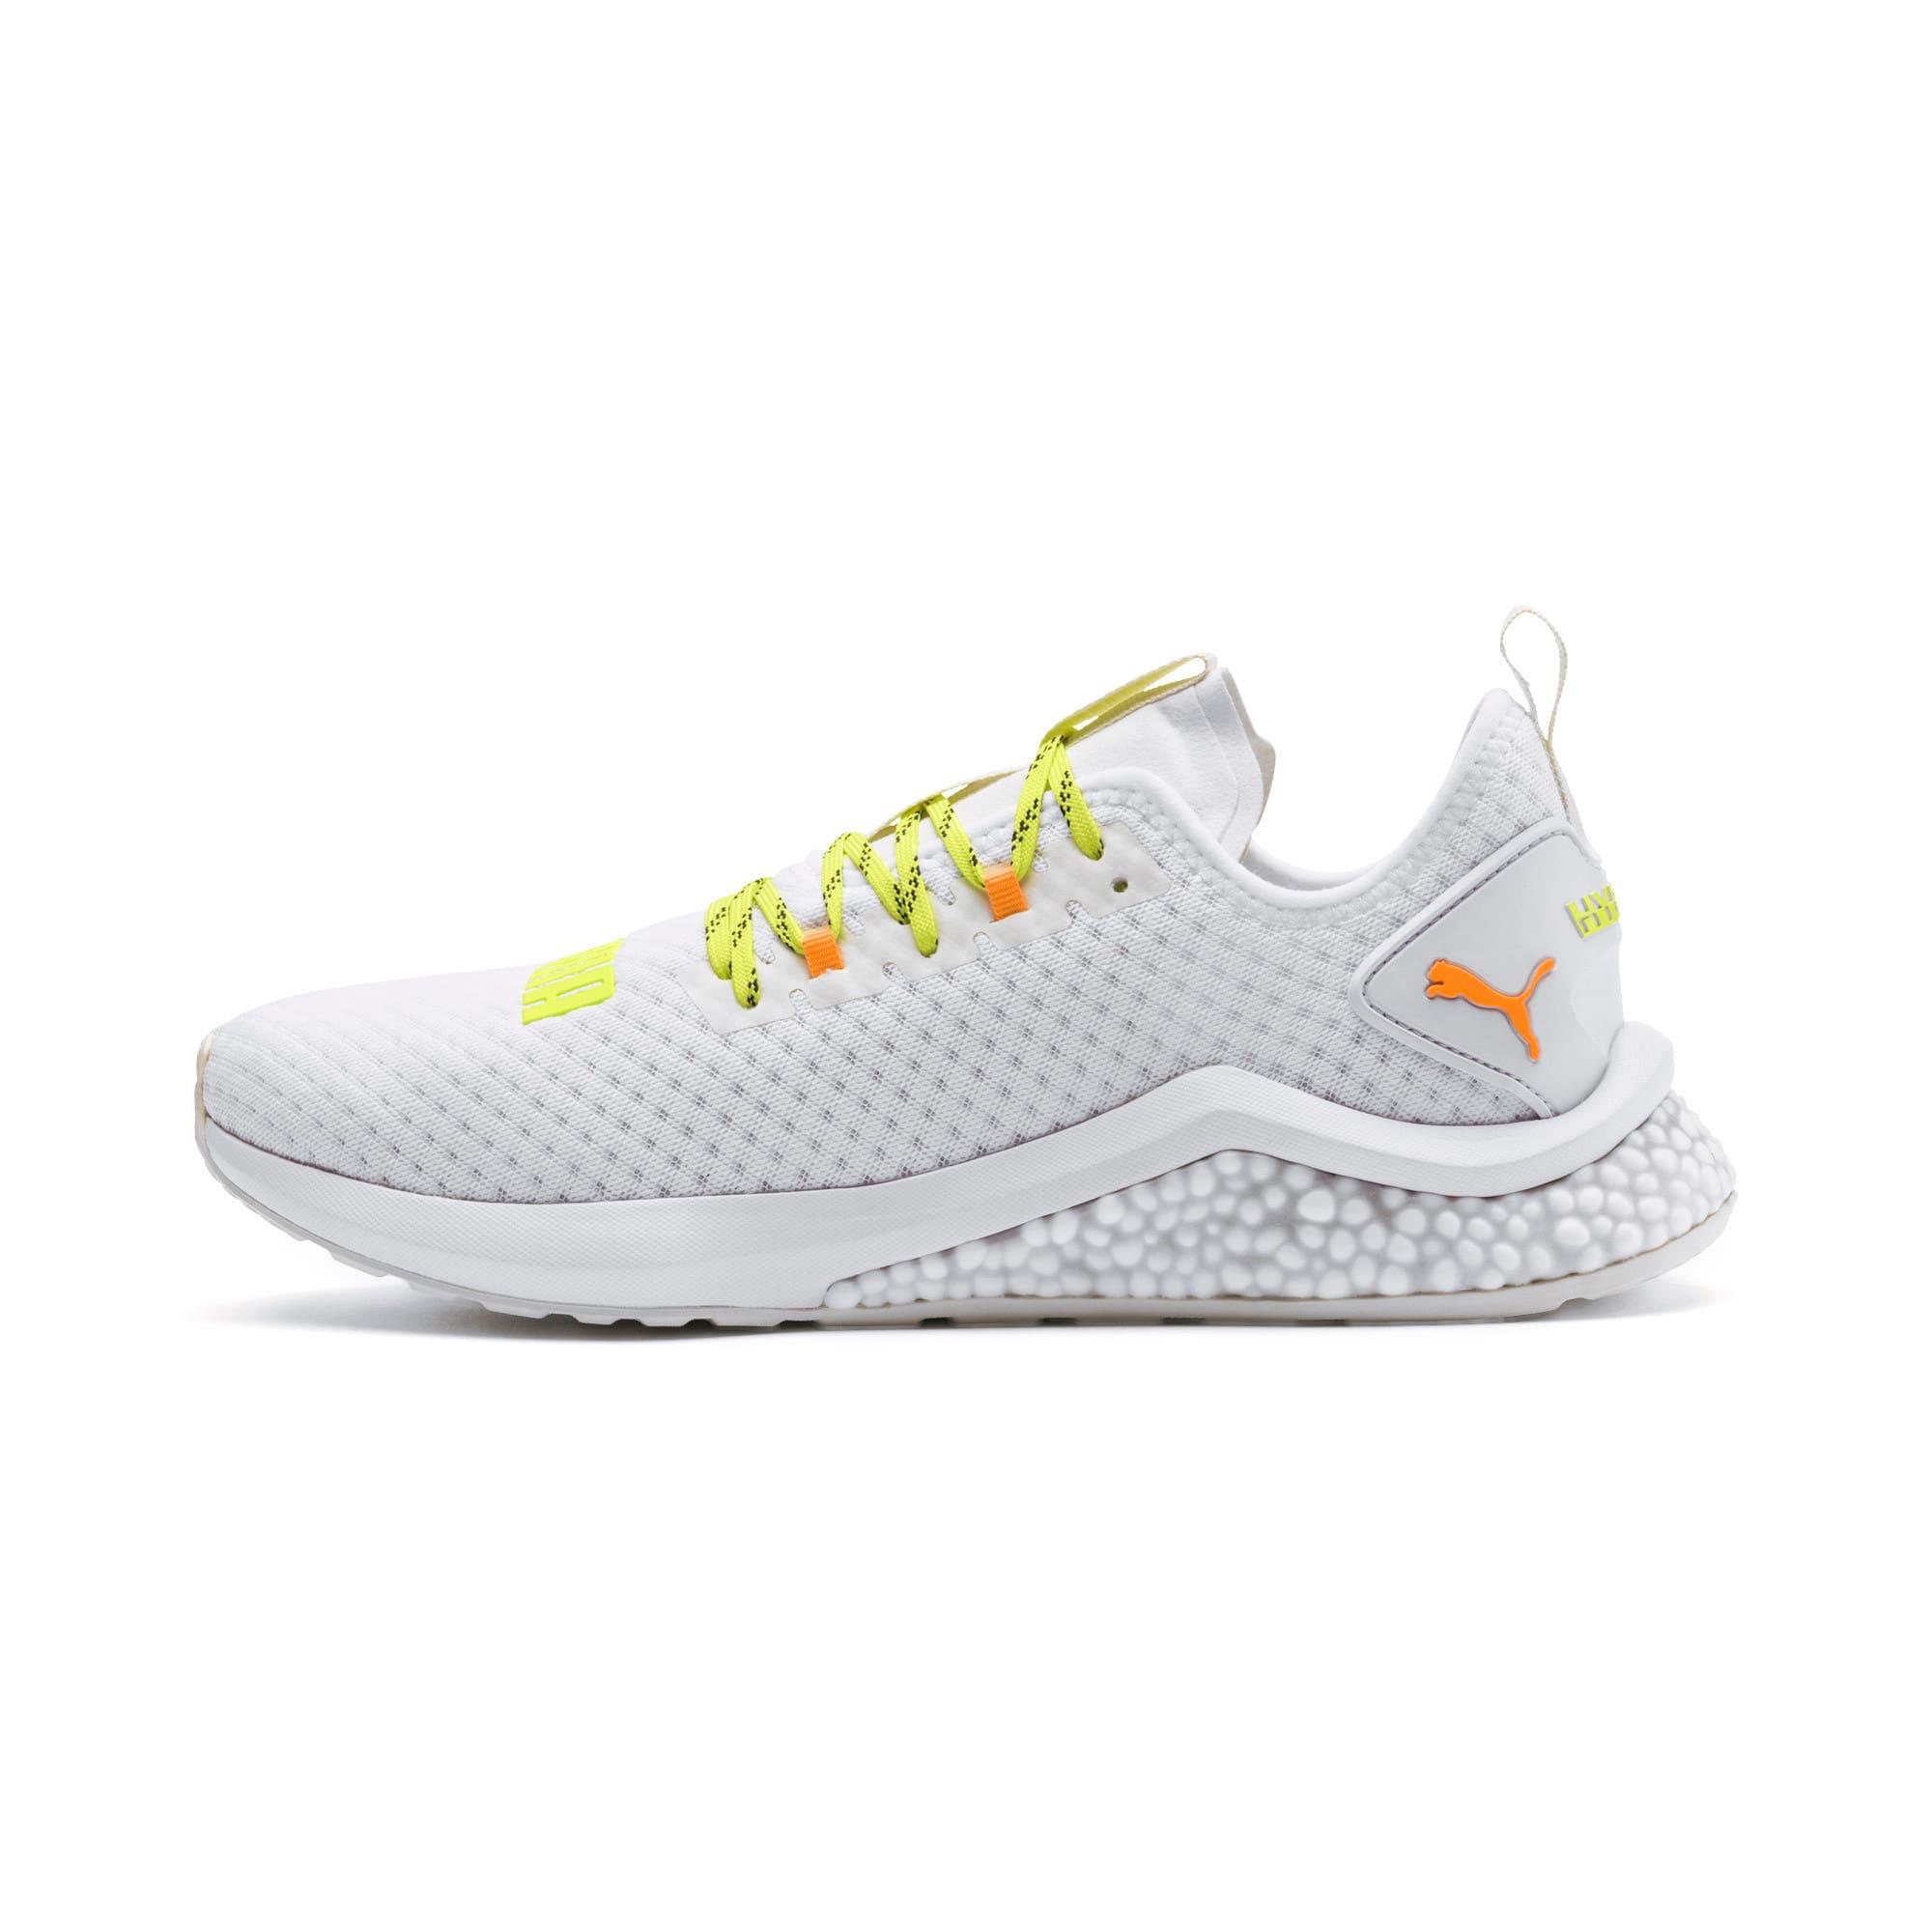 Thumbnail 1 of HYBRID NX Daylight Men's Running Shoes, White-Orange Pop-FizzyYellow, medium